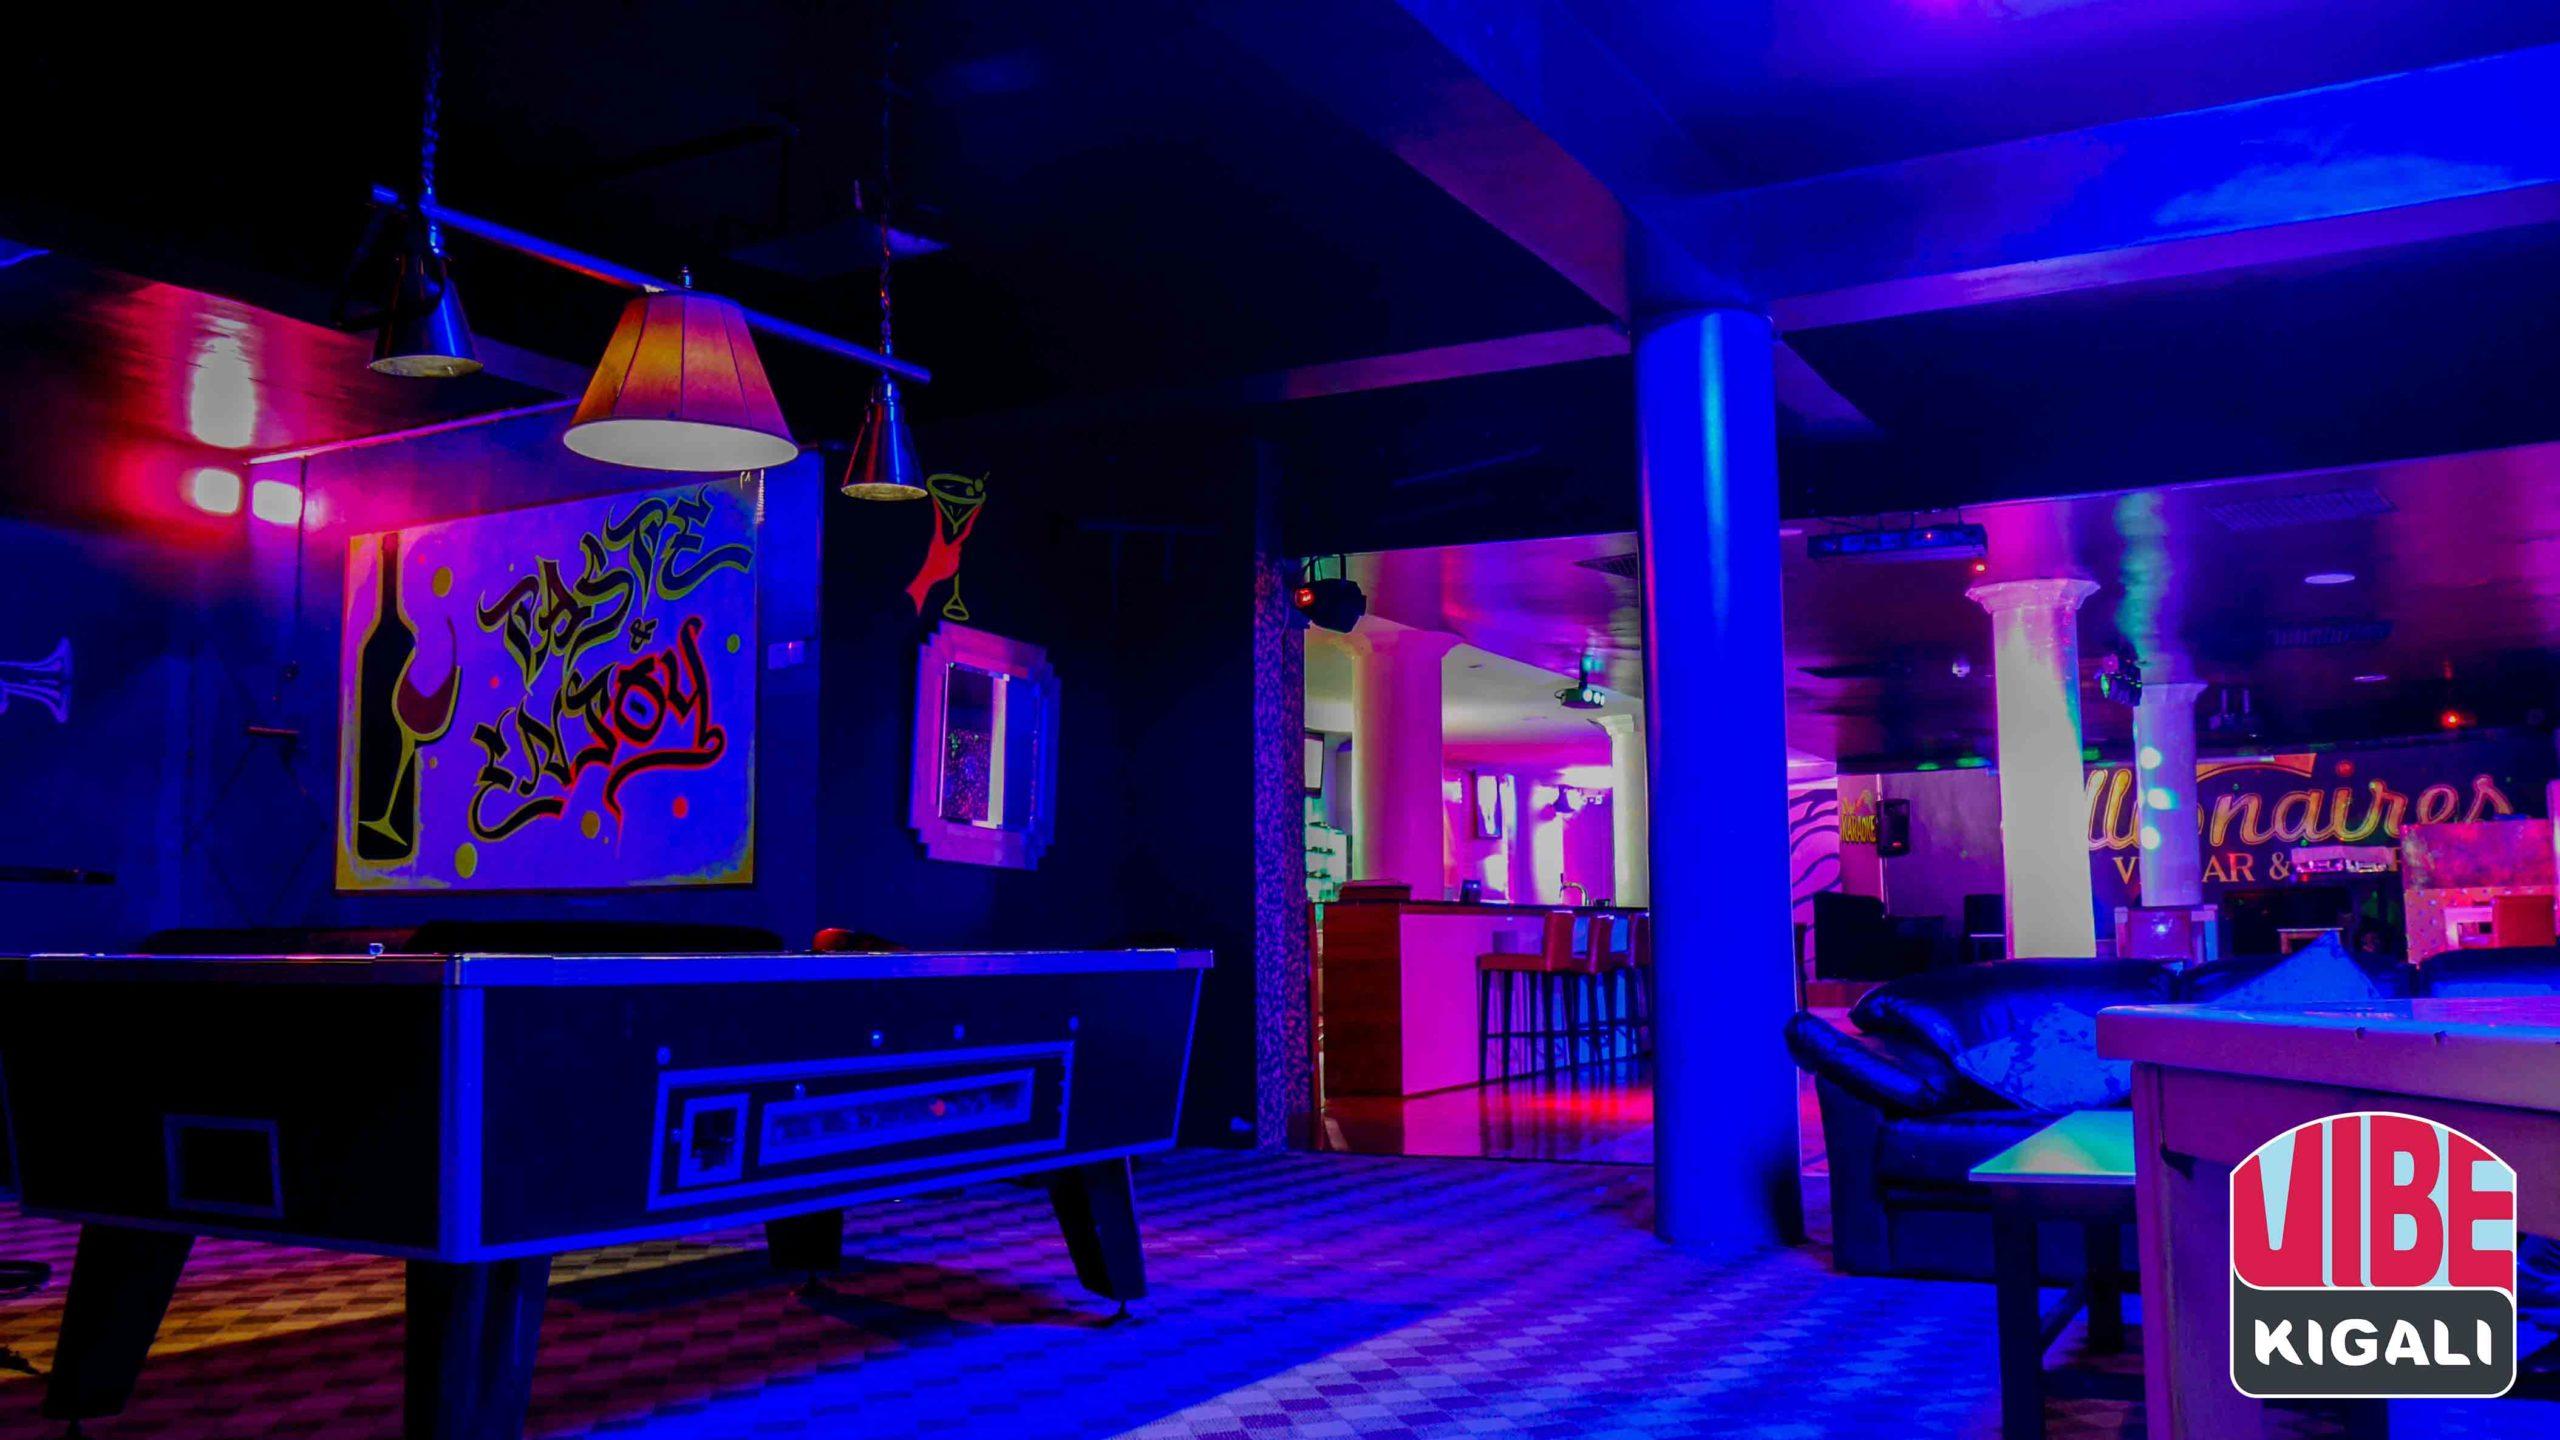 billionaires-bar-restaurant-kigali-12-2